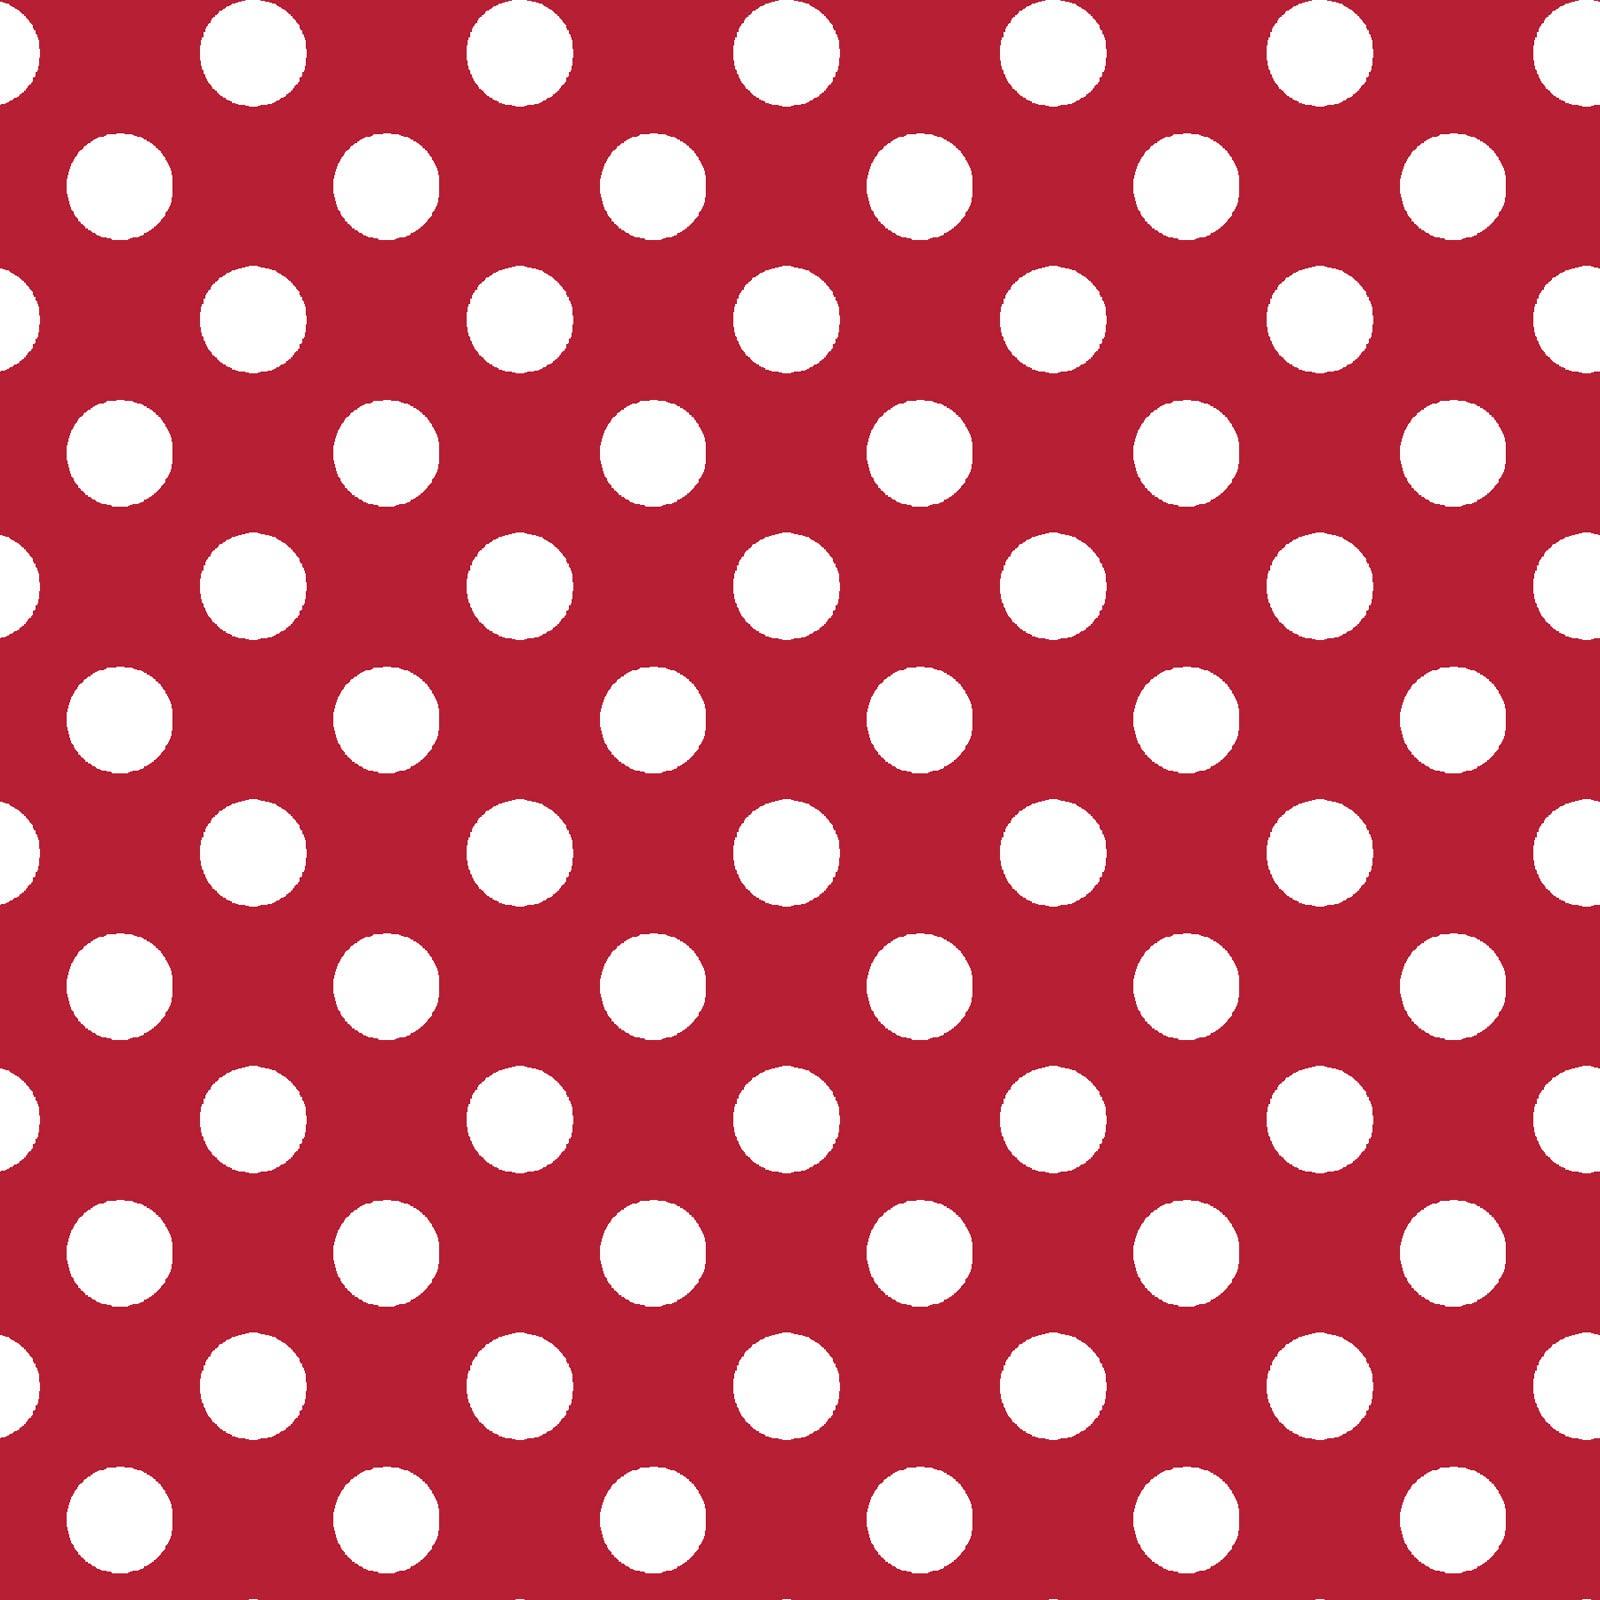 KimberBell Basic - Red Dots